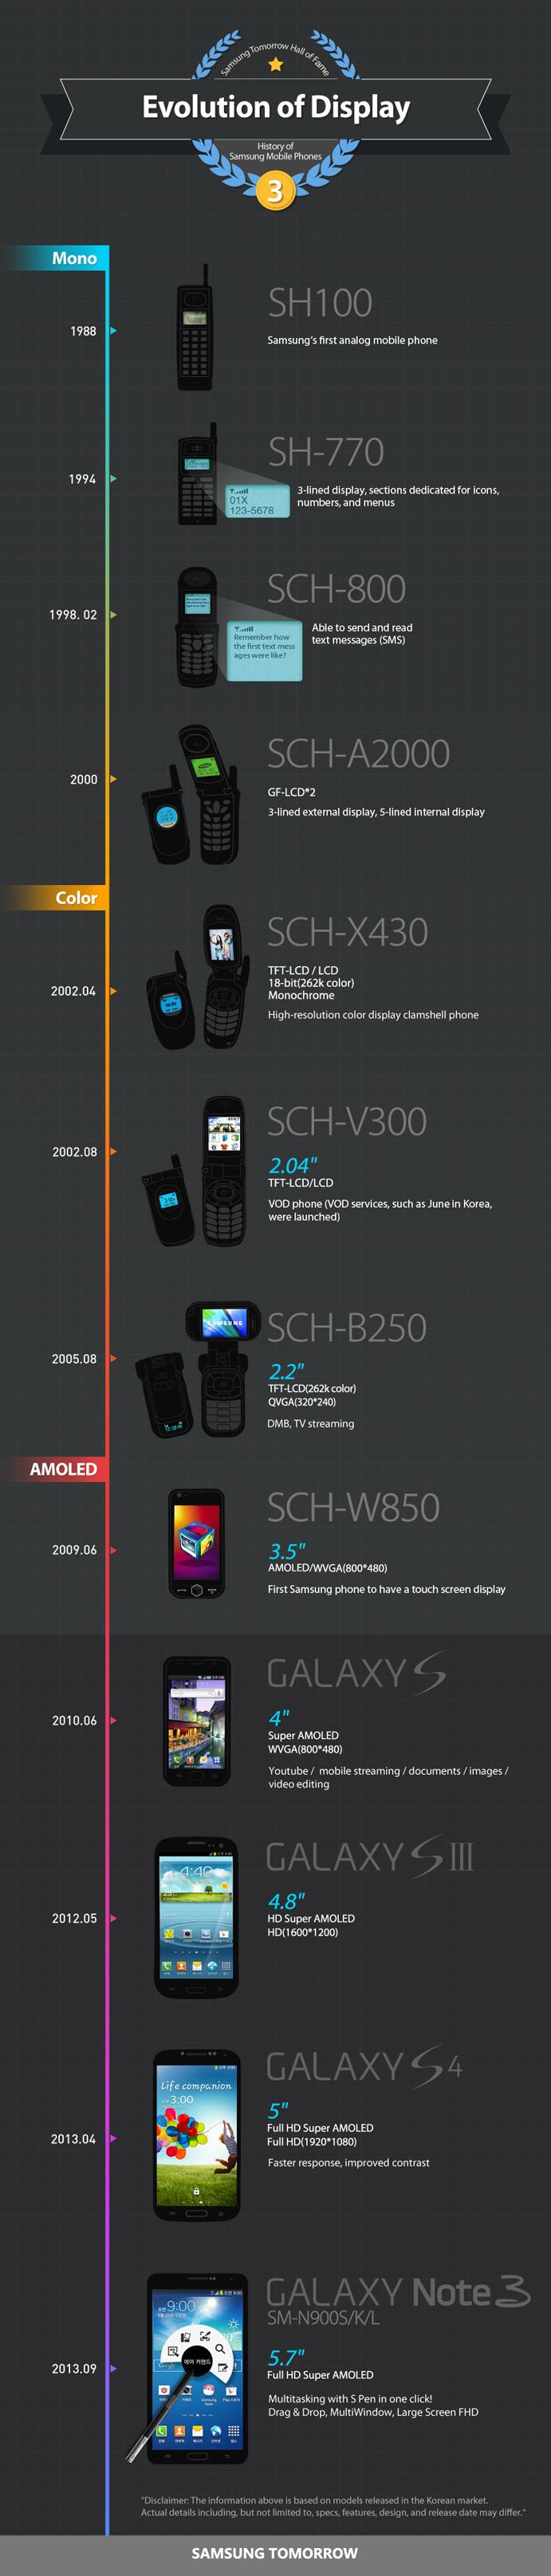 Evolution of Samsung Mobile Phones' Display